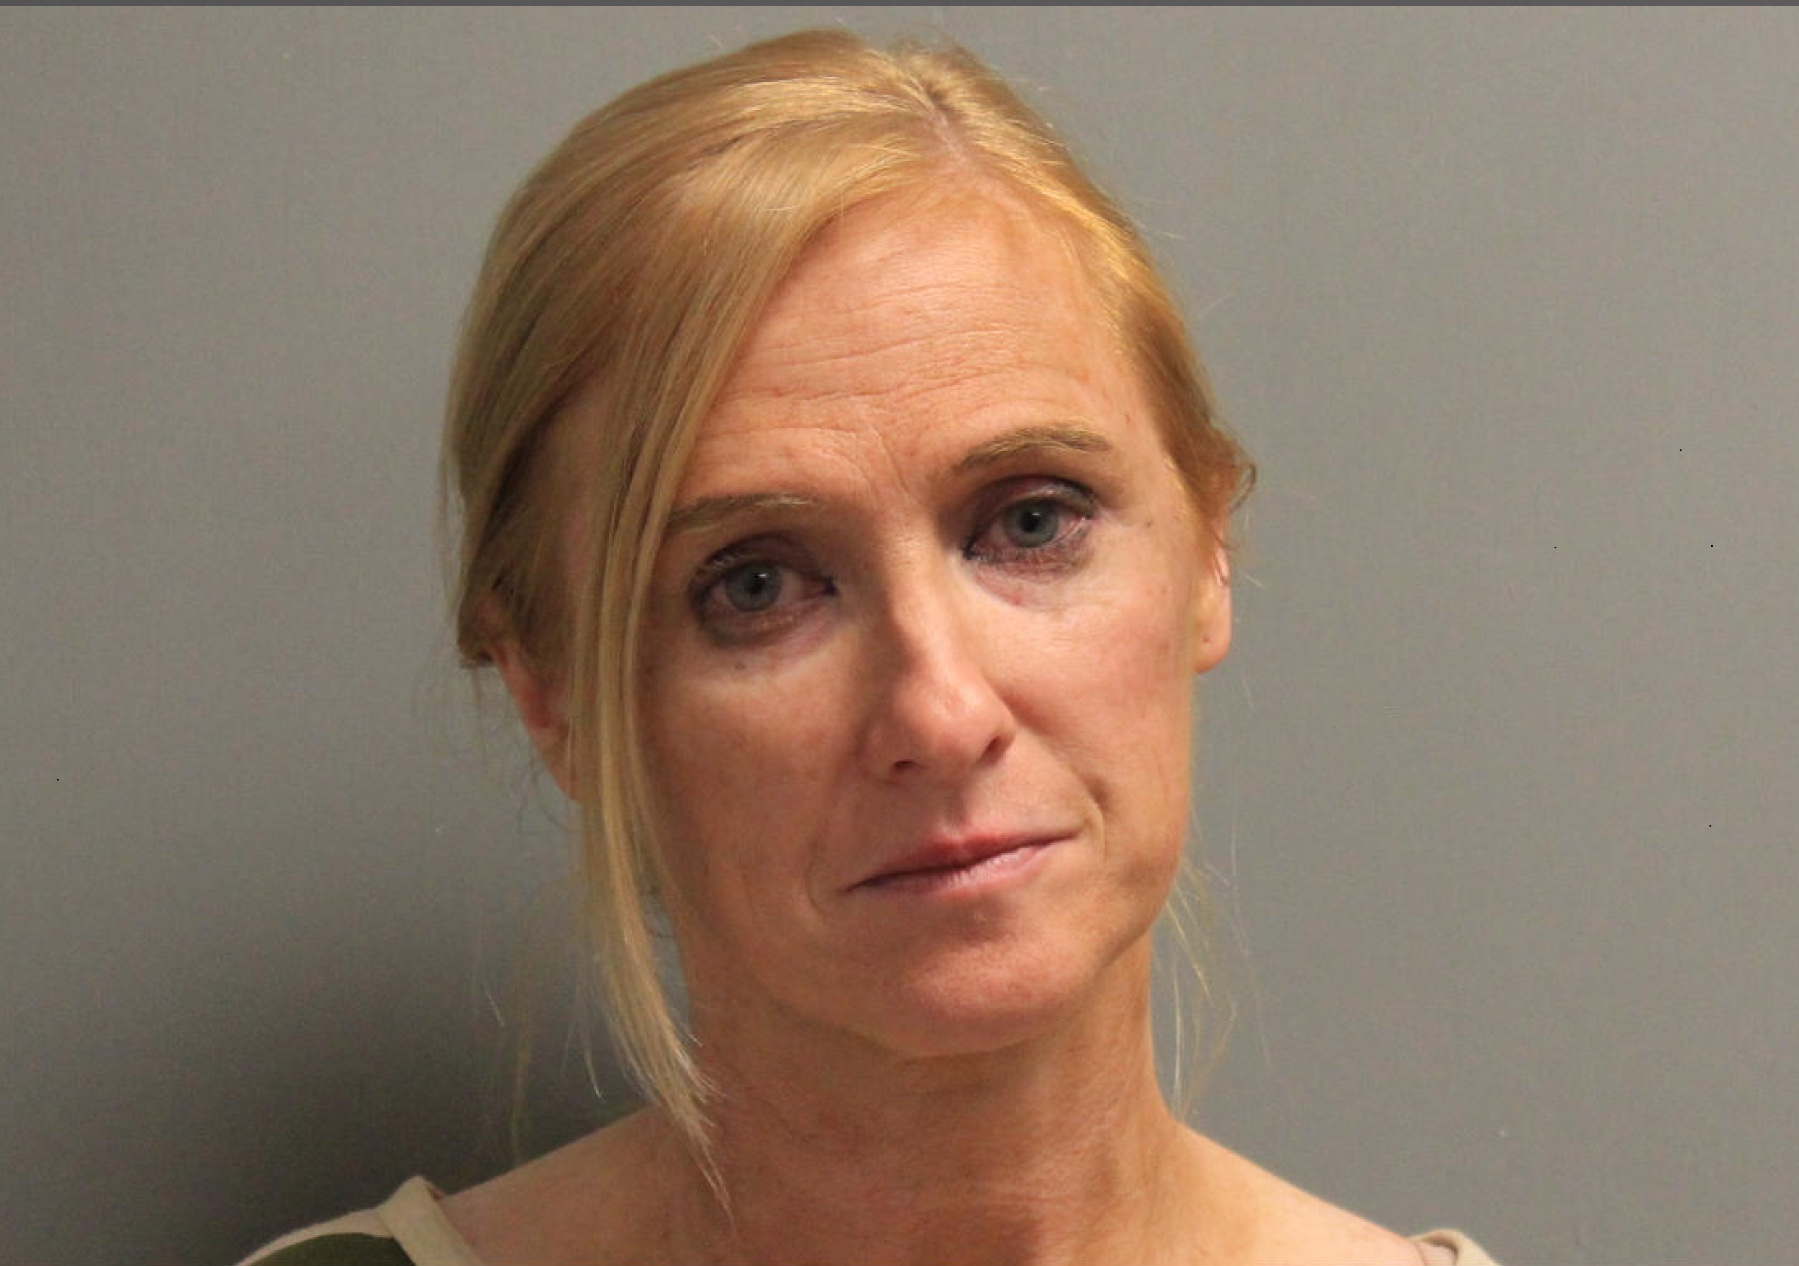 Teacher alcohol arrest_1540501943054.JPG.jpg